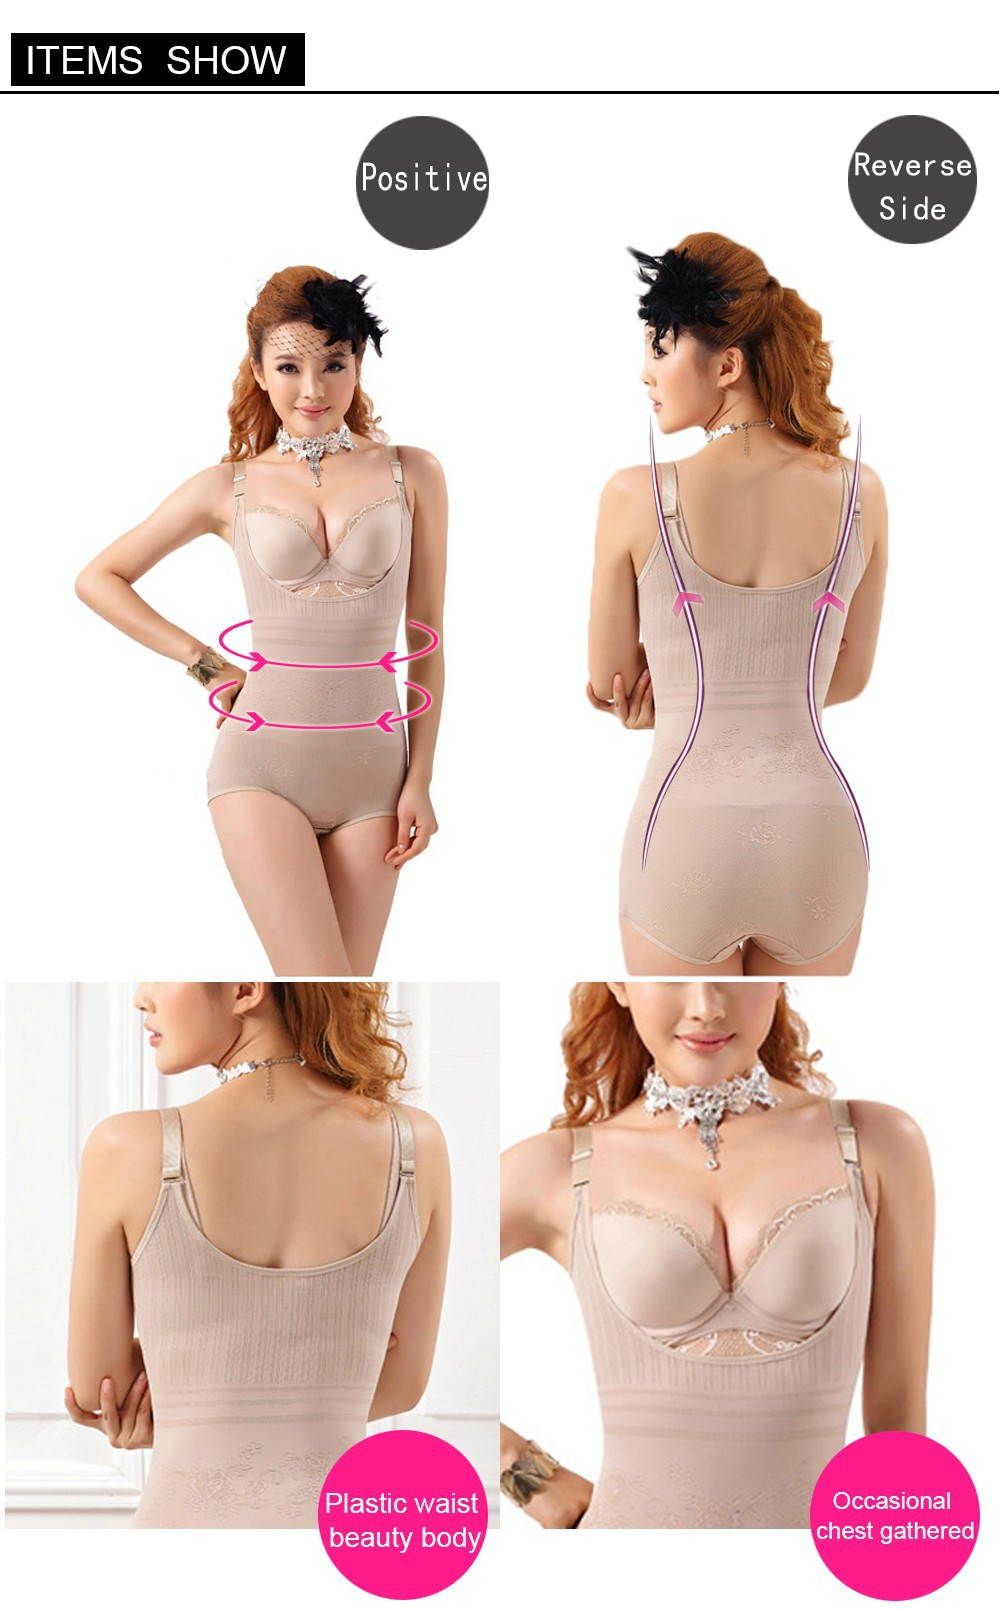 d4b2aca667d57 Women Floral Bodysuits Shapewear Underwear Plus size Body Shaper Waist  Training Corsets Buckle In The Crotch